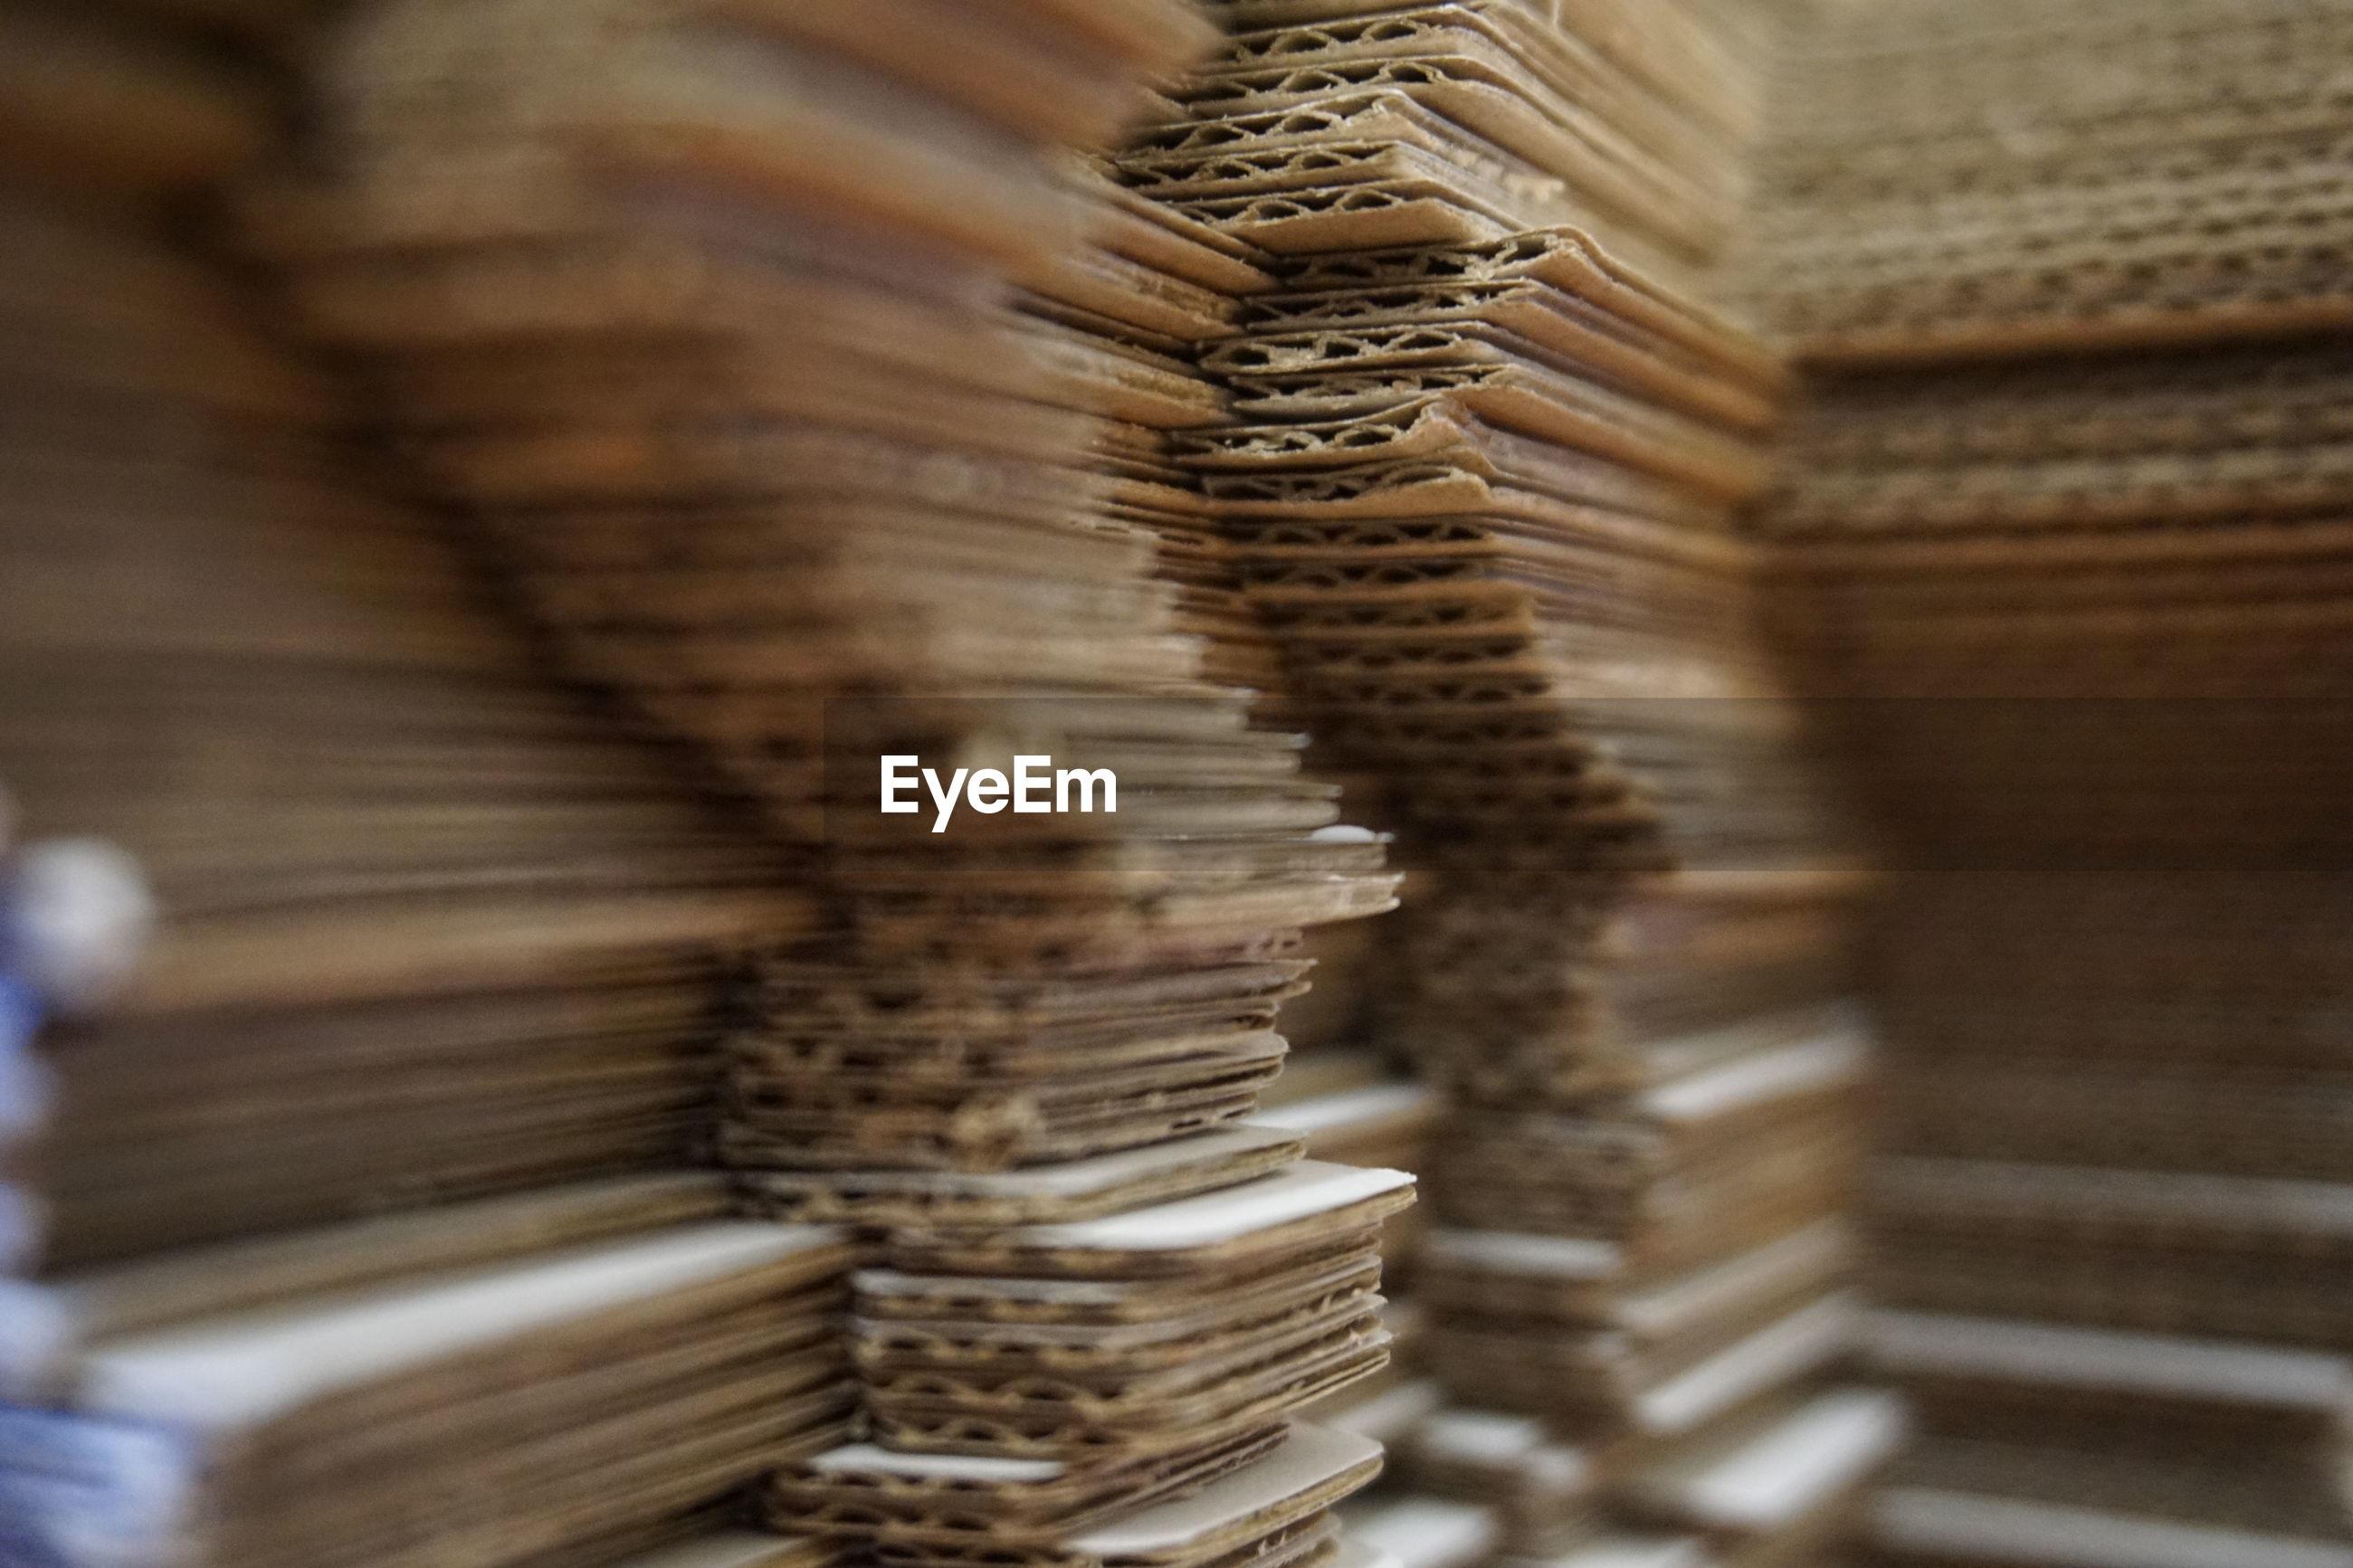 Close-up of cardboard